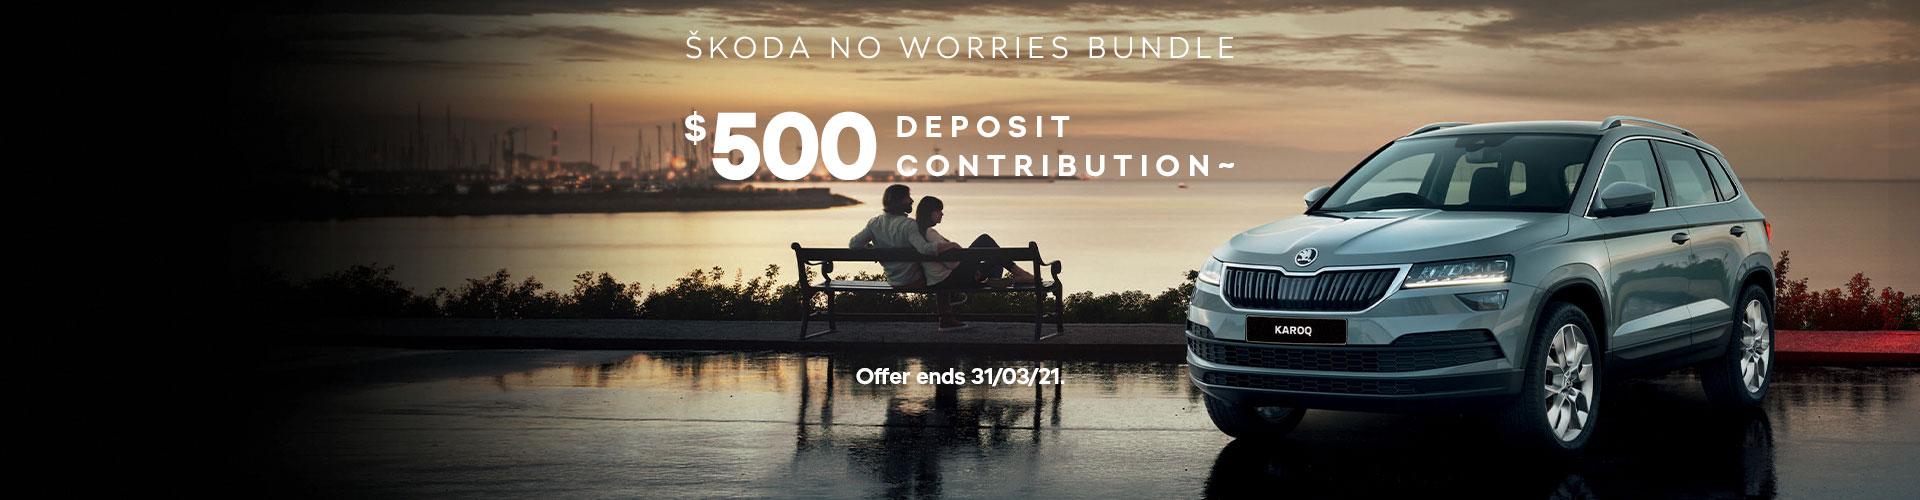 Skoda No Worries Bundle